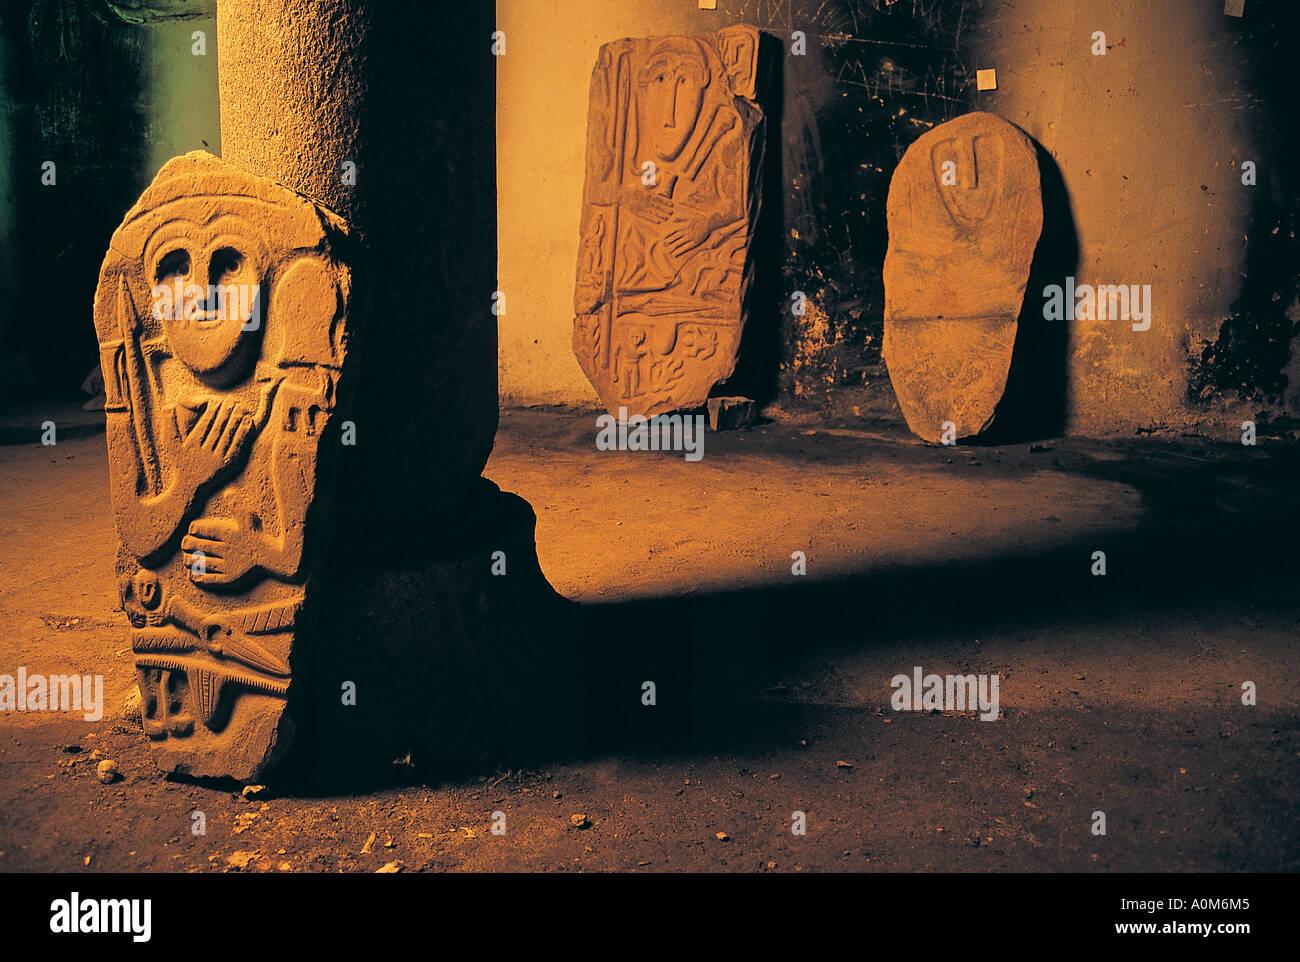 cdca9e718d Kimmerian steles dates B.C. 6th century discovered in Hakkari Turkey. -  Stock Image